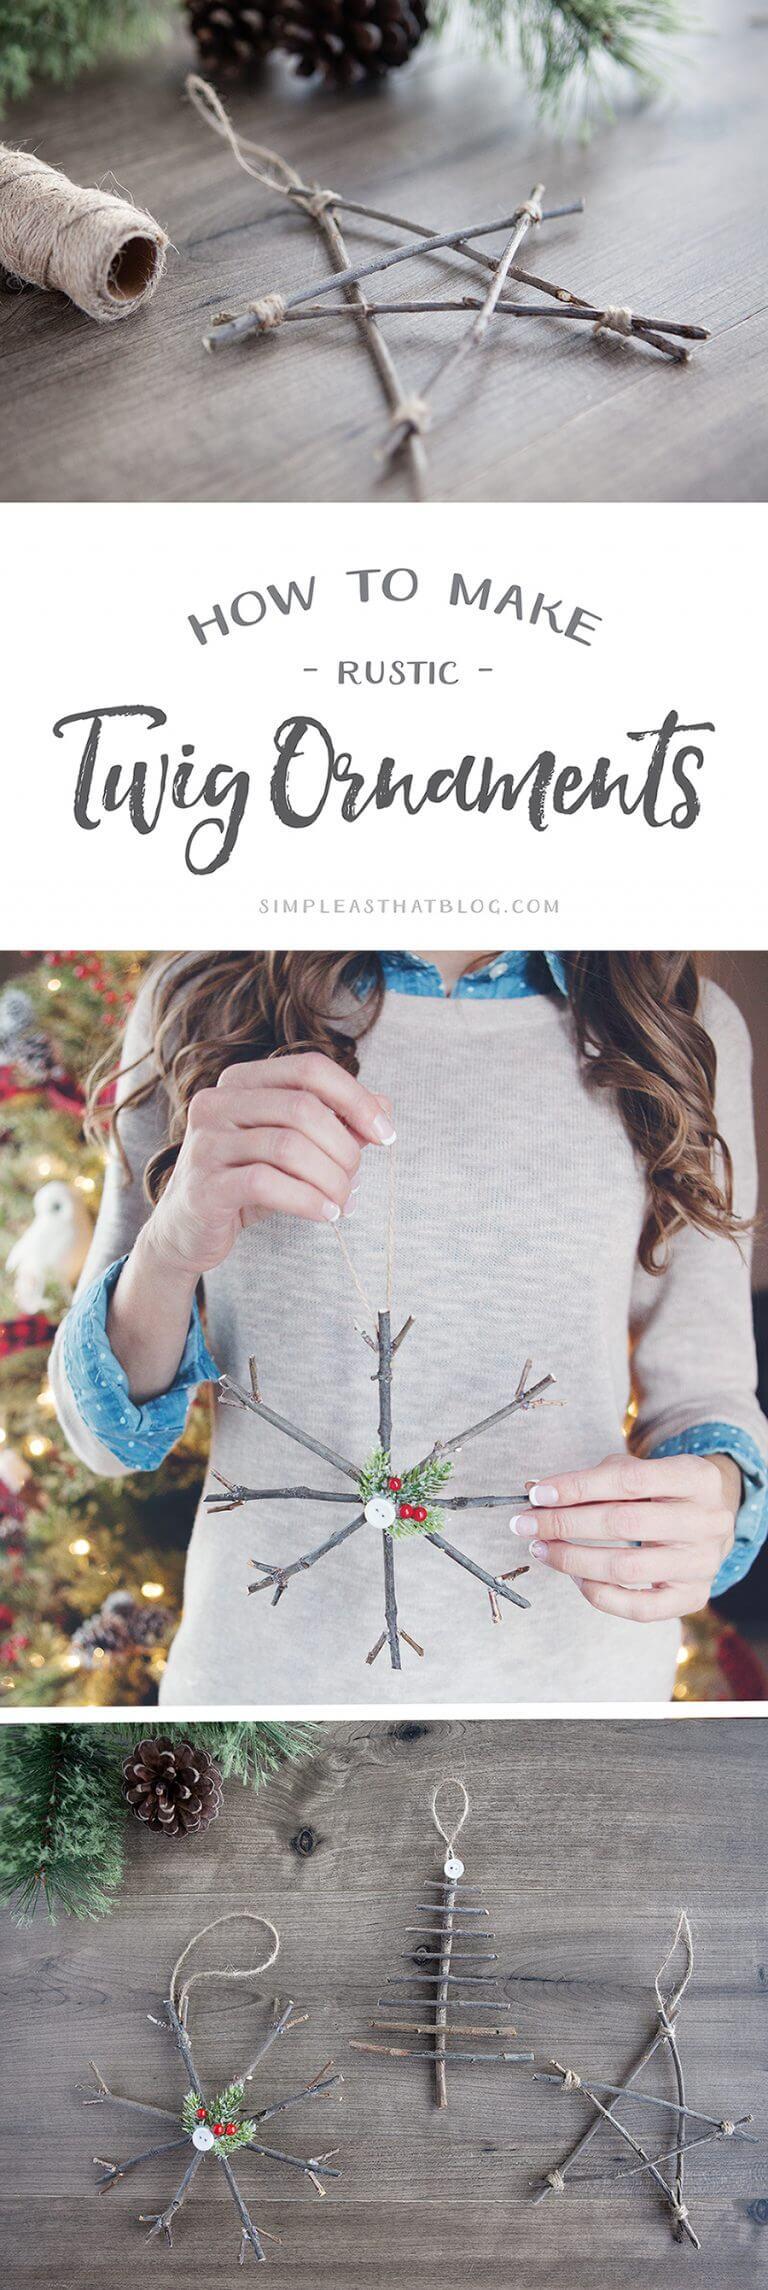 Easy to make Xmas decorations, homemade Christmas decorations, twig Christmas decoration tutorial